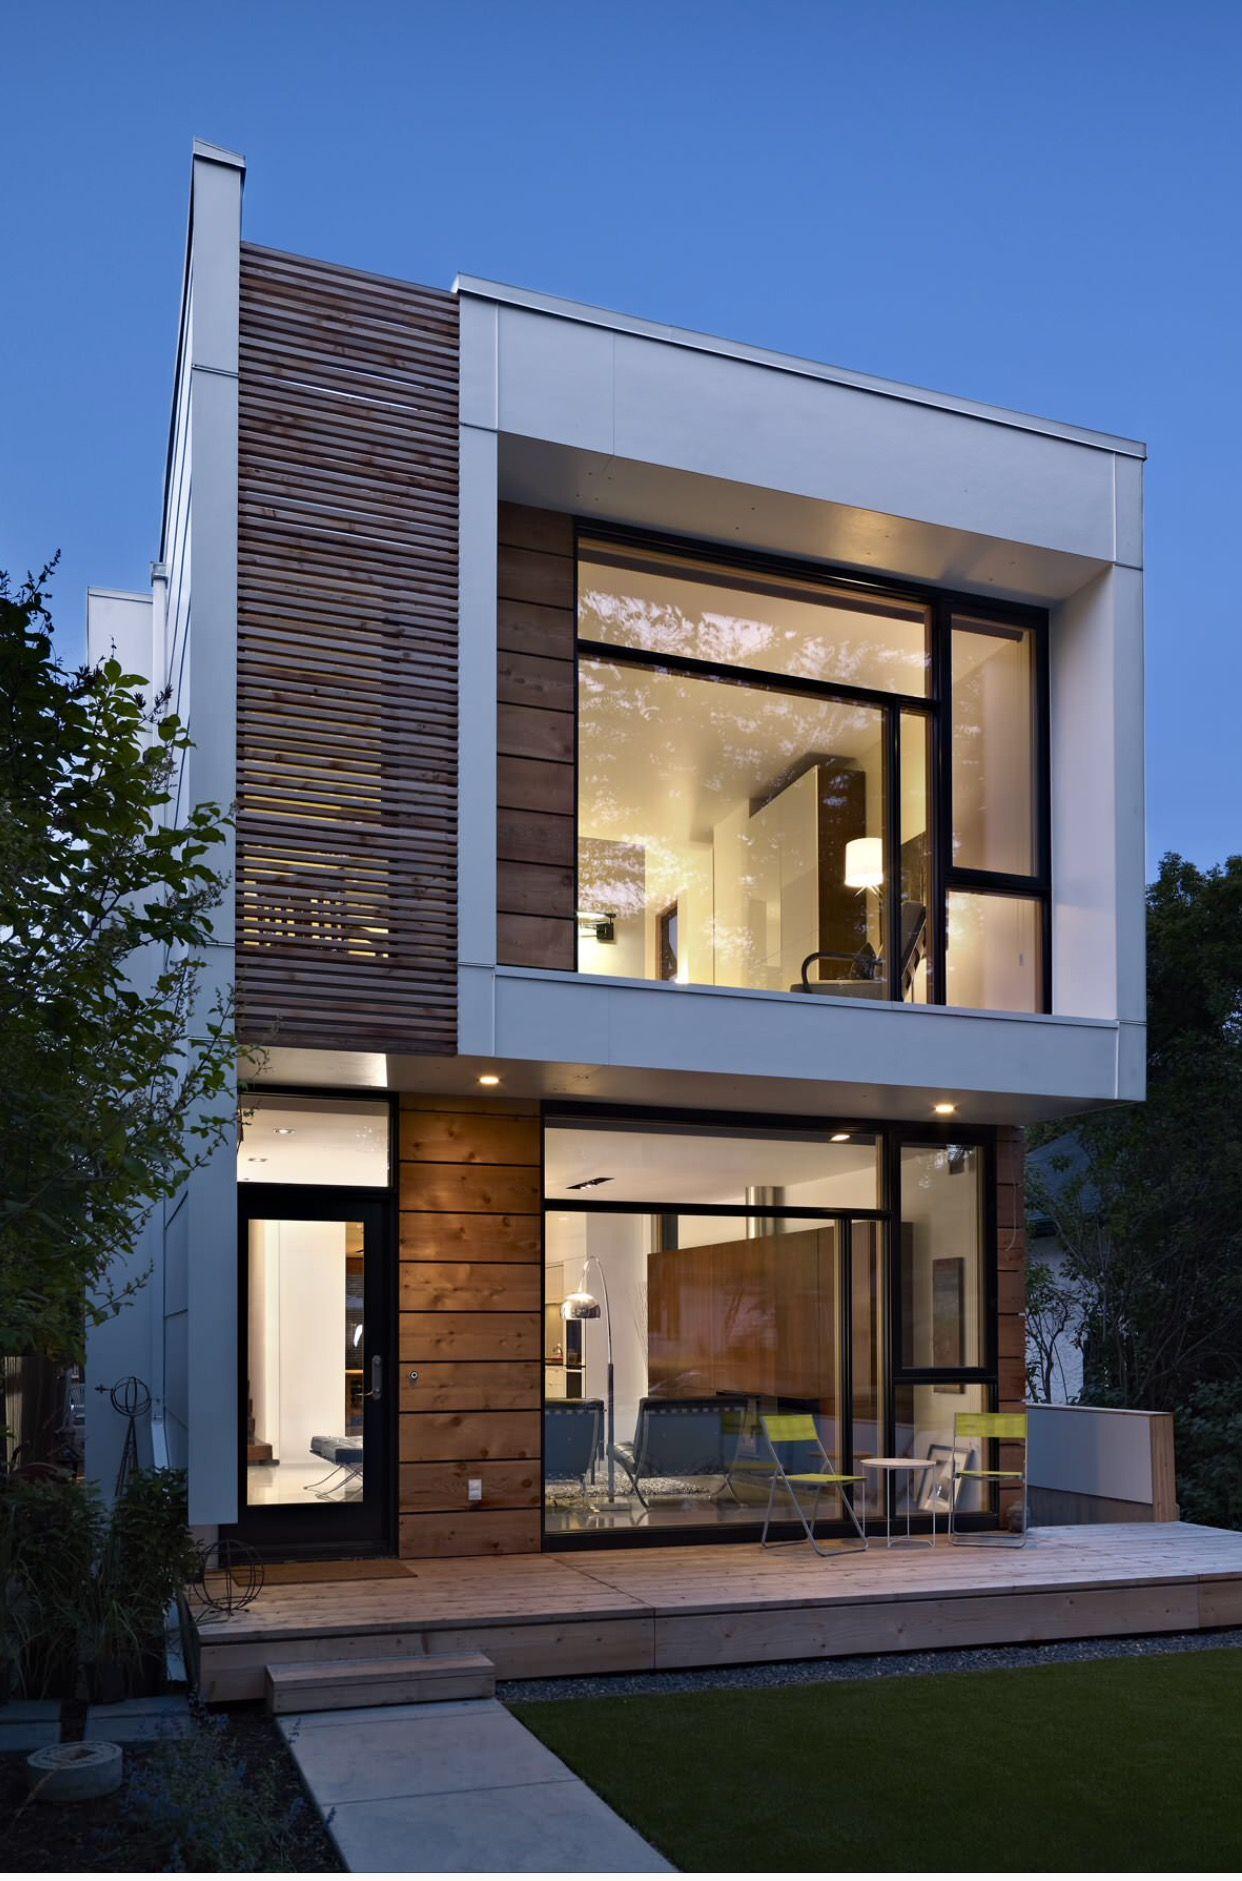 Pin by Kamlesh Agarwal on Modern & Unique Homes | Modern house facades,  Small house design, Facade house